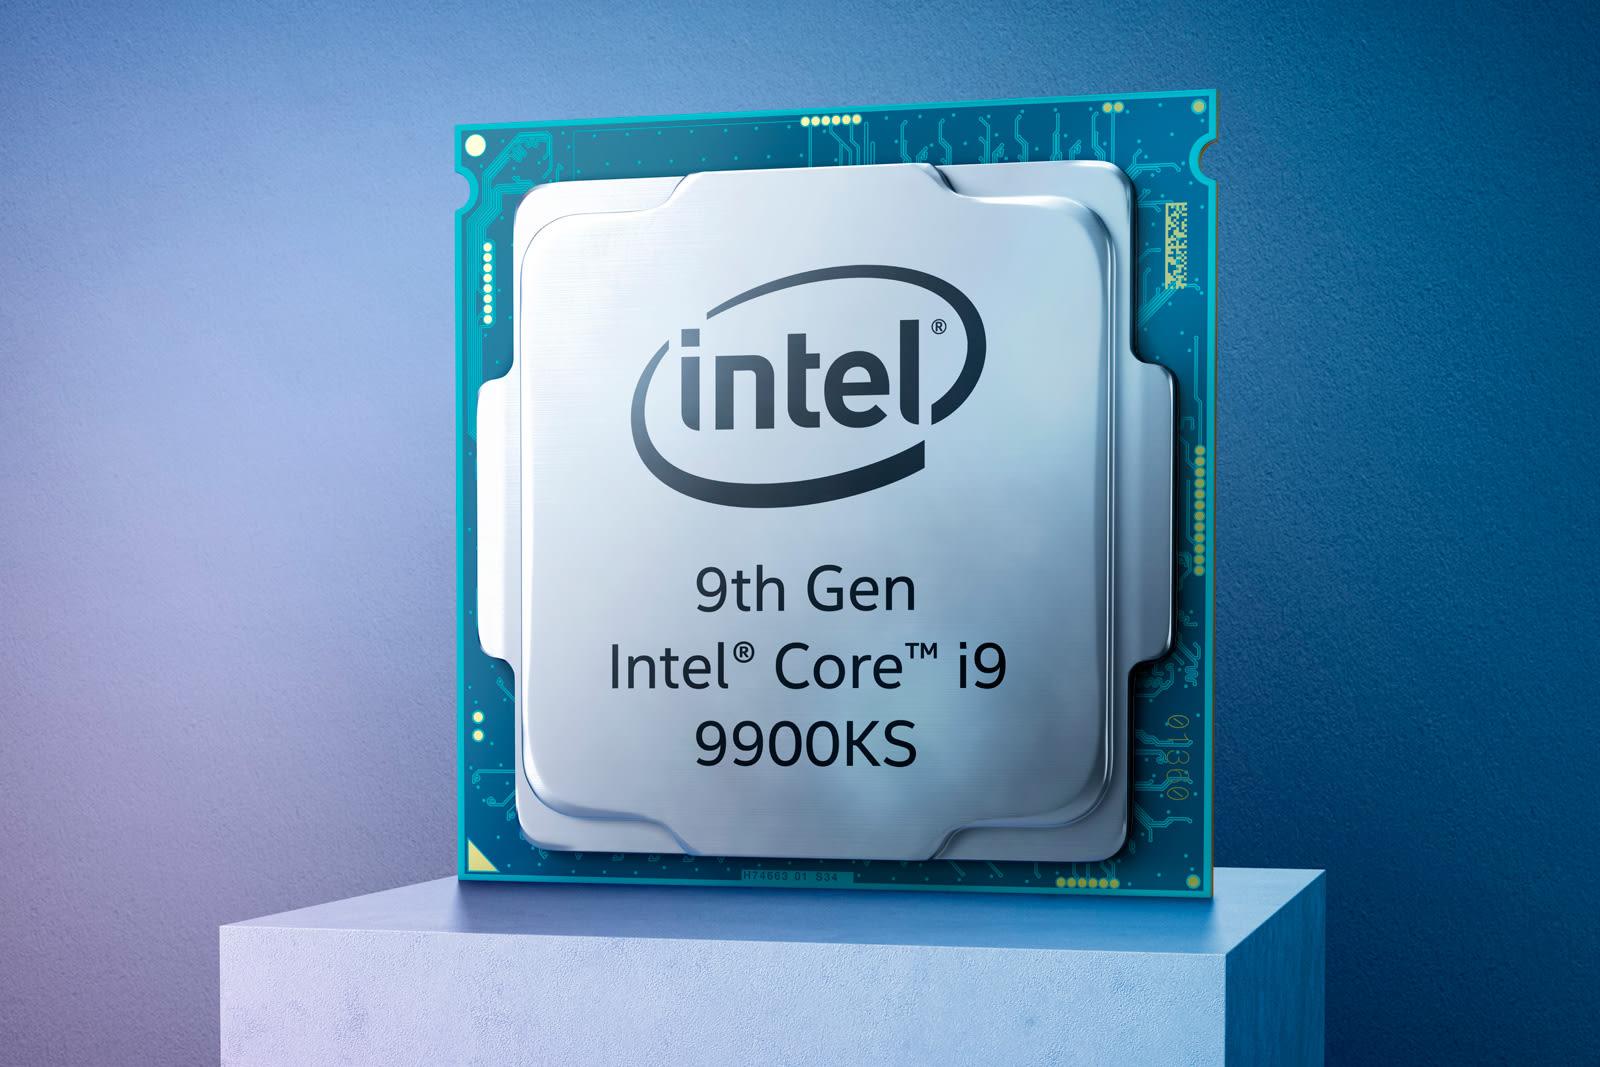 Intel Core i9-9900KS special edition processor